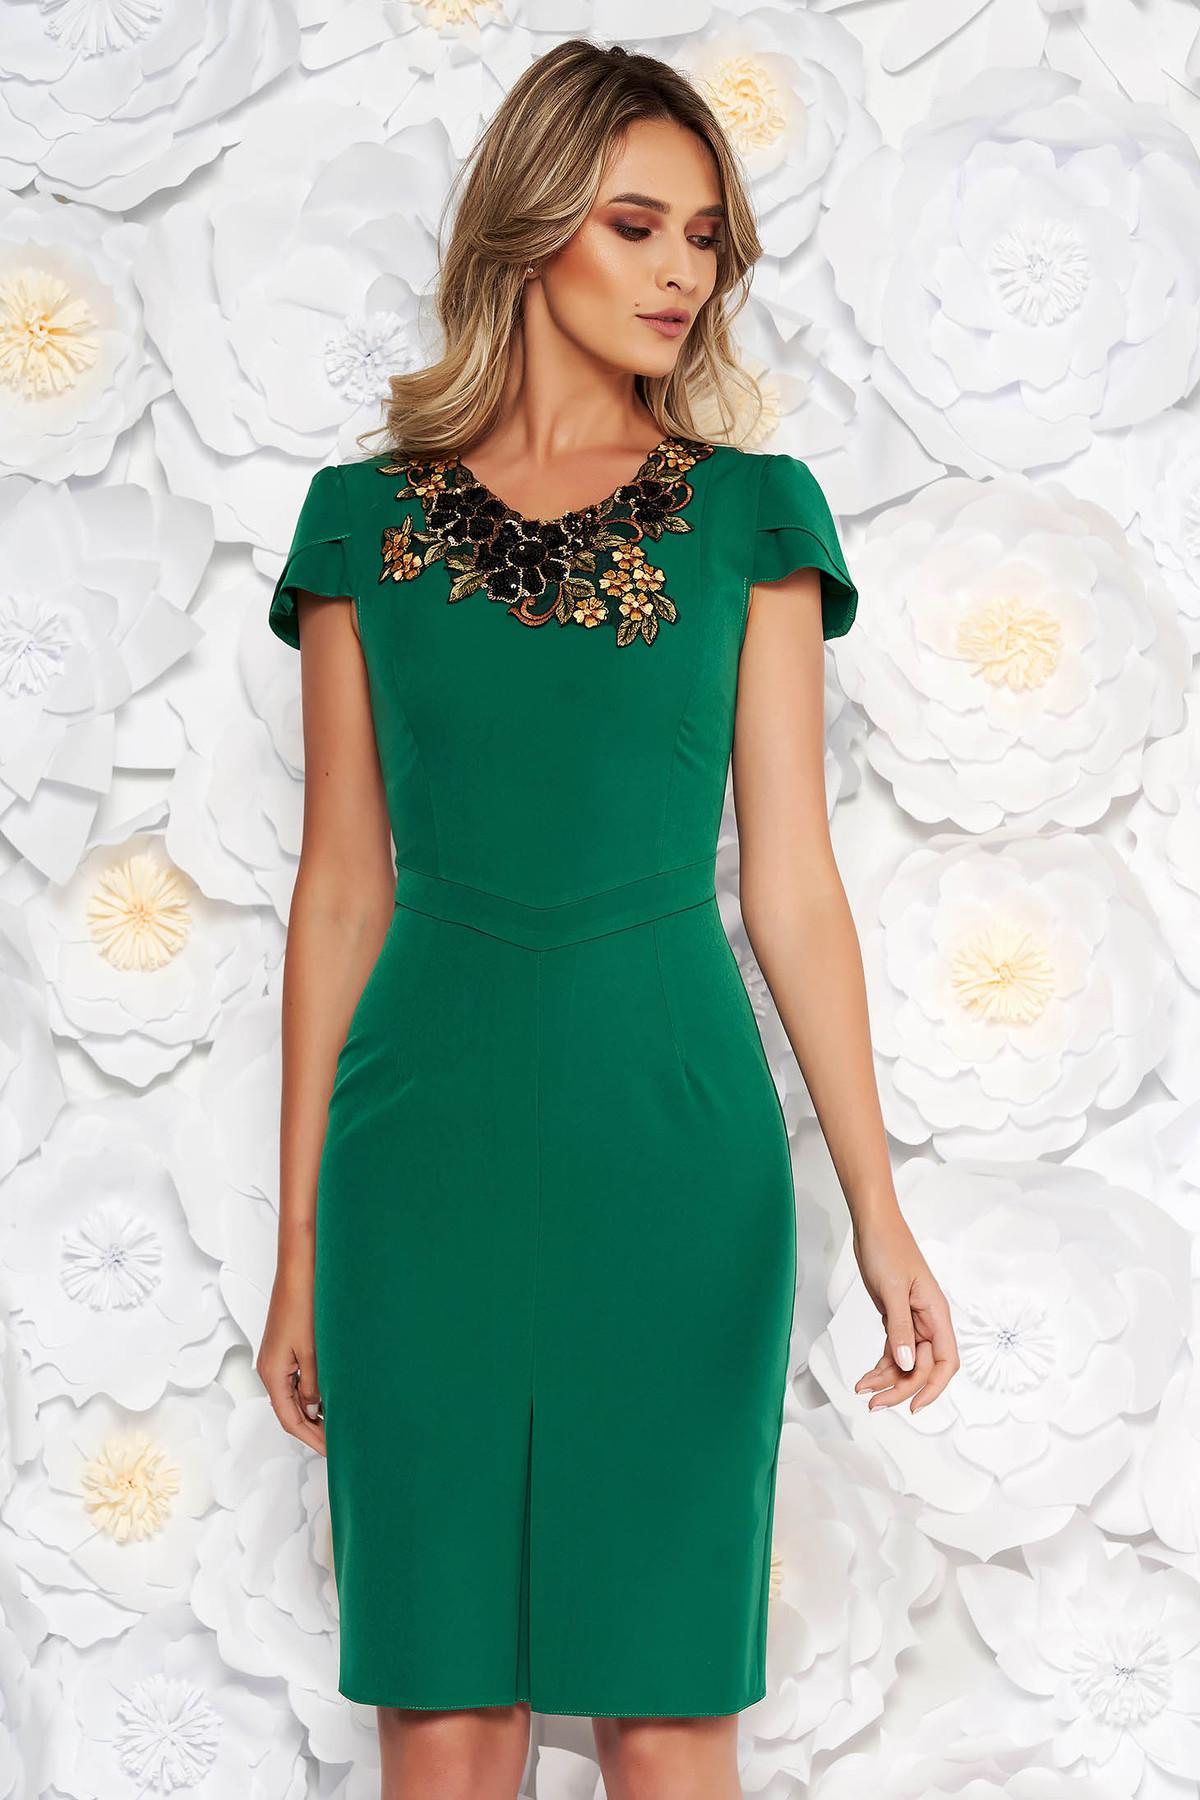 Rochie verde eleganta tip creion din stofa subtire usor elastica cu aplicatii cusute manual